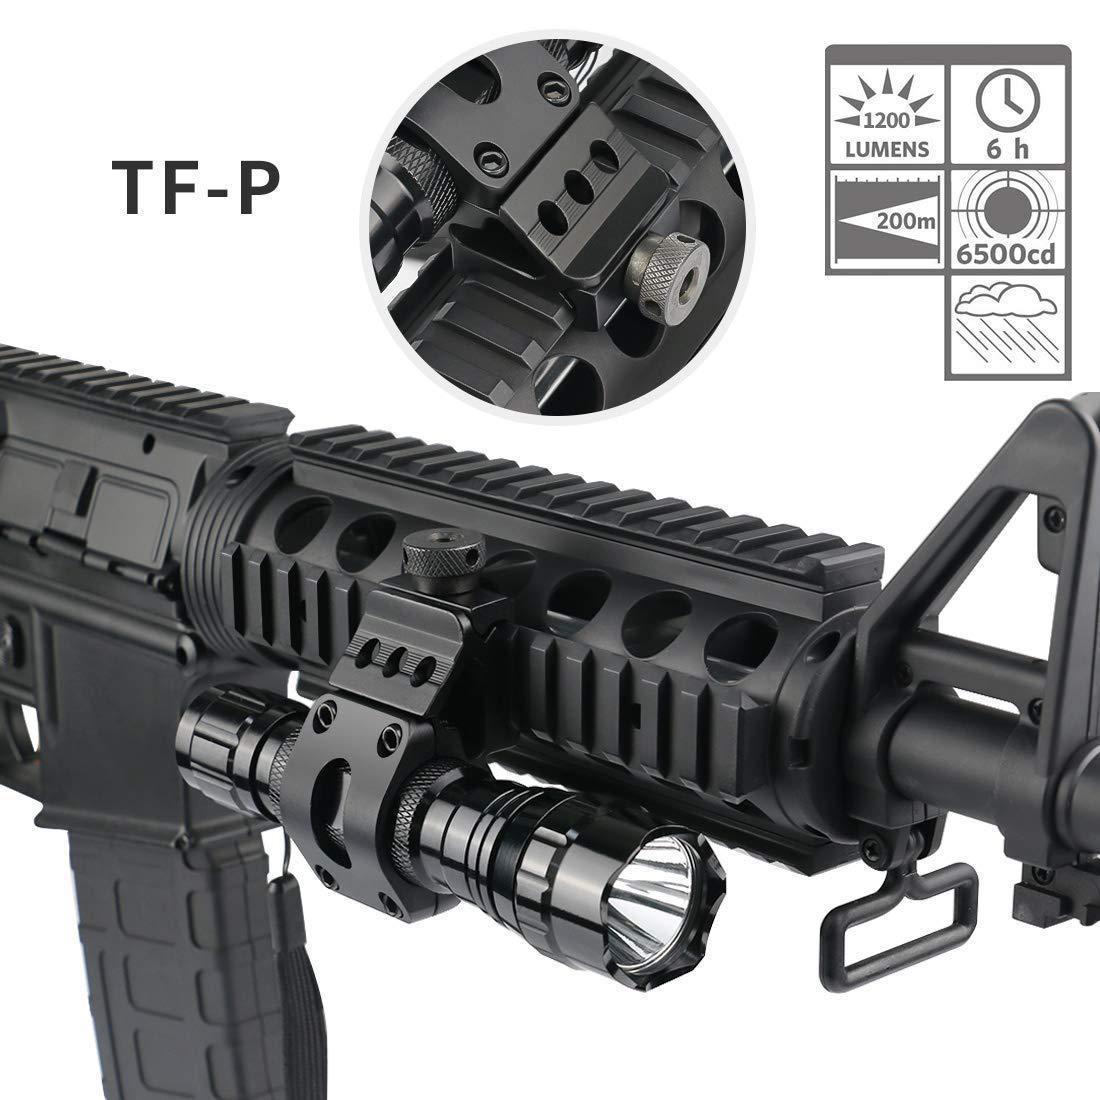 Táctica 1200LM LED 501B caza Airsoft linterna para arma de fuego luz Scout exterior Rifle pistola linterna Fit 20mm Rail